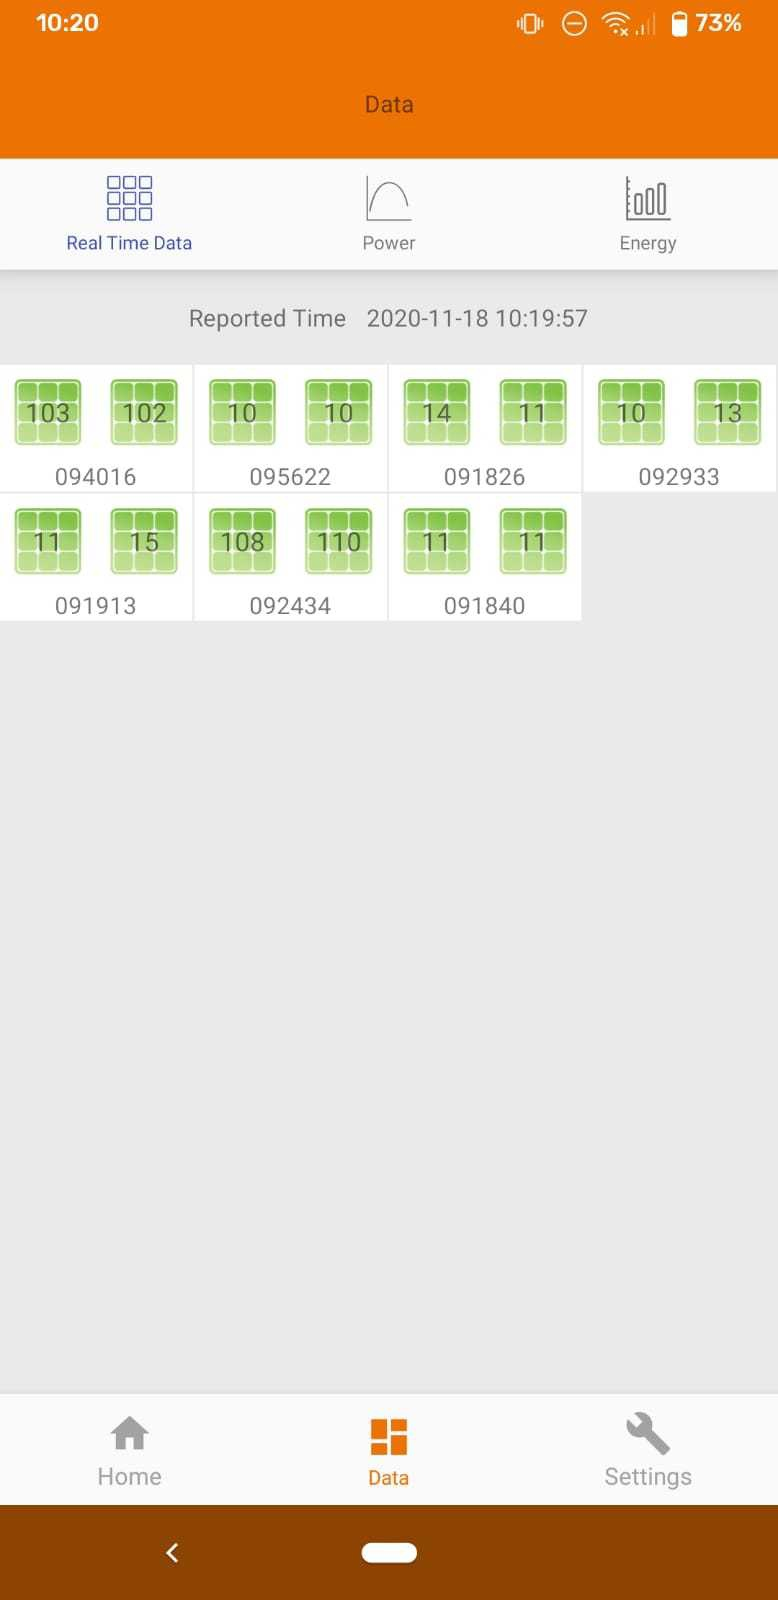 https://tweakers.net/i/3qO7cLCPxQwJKhfkIr4oTj10lHU=/full-fit-in/4920x3264/filters:max_bytes(3145728):no_upscale():strip_icc():fill(white):strip_exif()/f/image/ENH0xVd493s2k9FqboGv0tRf.jpg?f=user_large